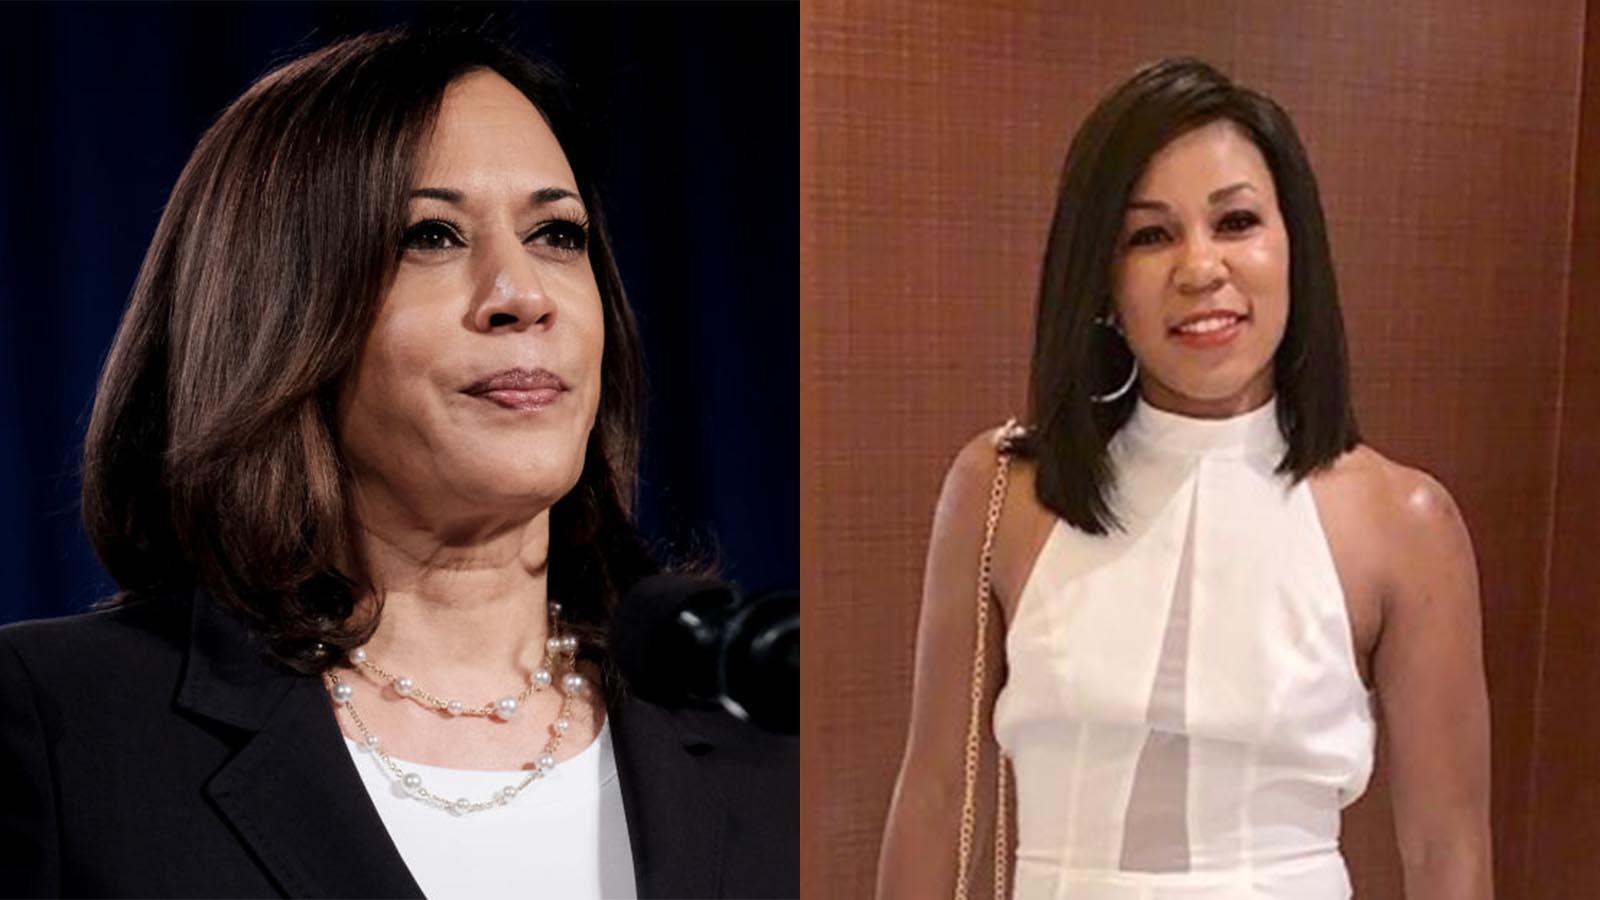 Woman Will Undergo Plastic Surgeries To Look Like Kamala Harris Texas Surgeon Ktla